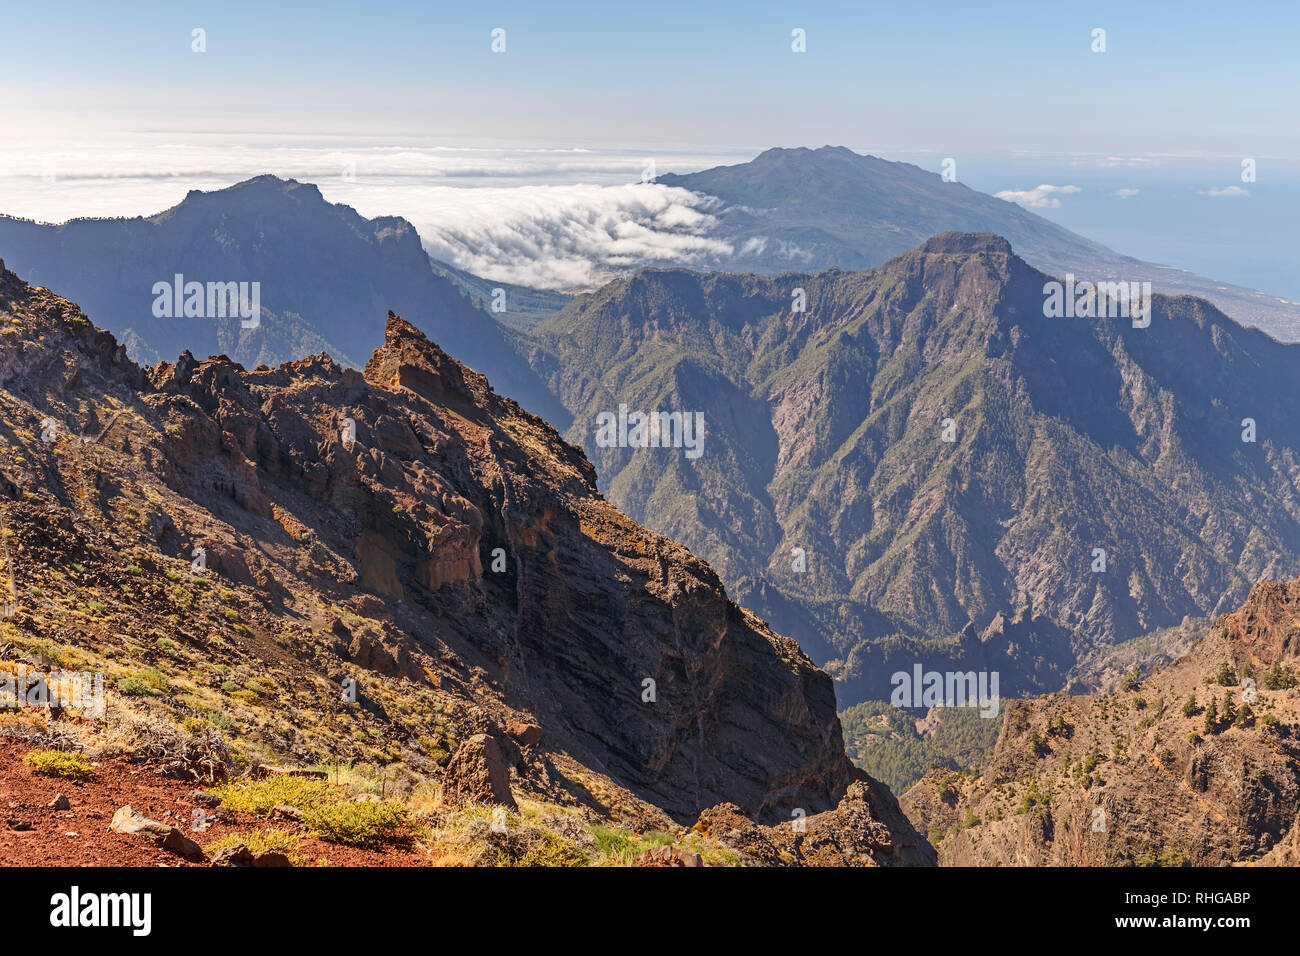 Caldera de Taburiente Natoional Park von Roque de Los Muchachos Sicht gesehen, La Palma, Kanarische Inseln Stockfoto